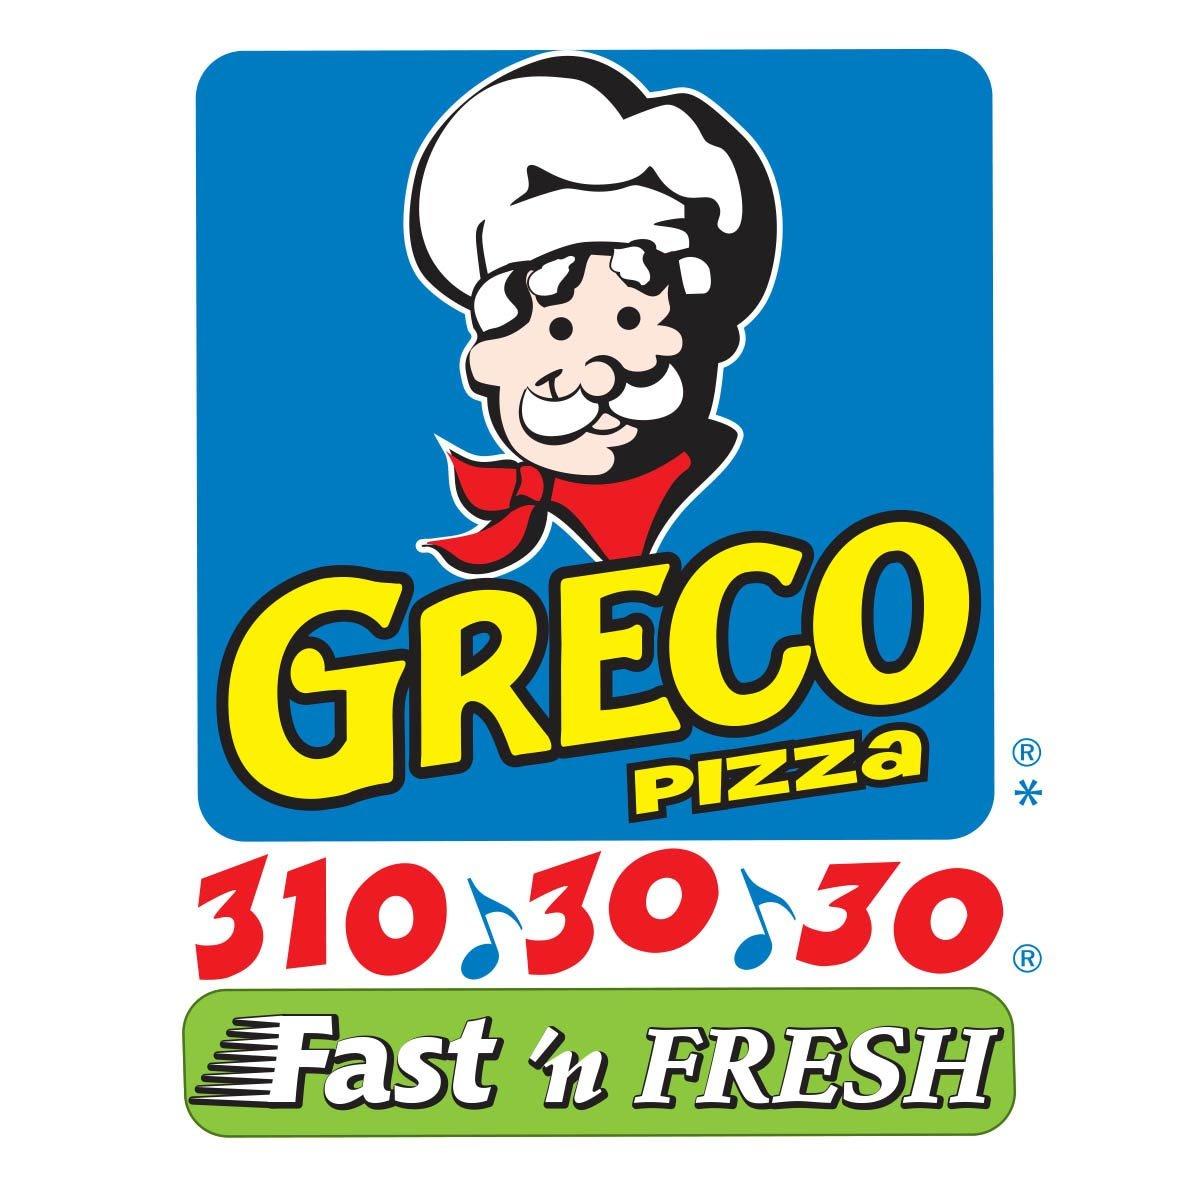 Most Popular Pizza food in Halifax, Nova Scotia, Canada